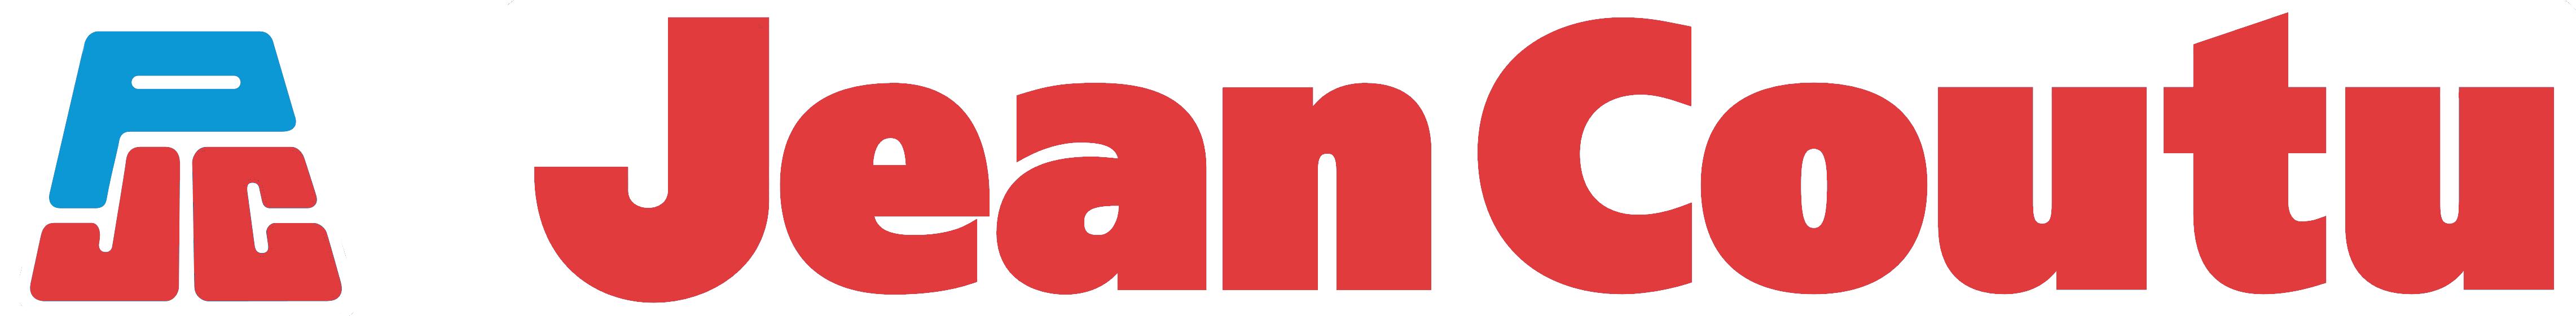 jean coutu logos download notre dame logo vector free university of notre dame logo vector